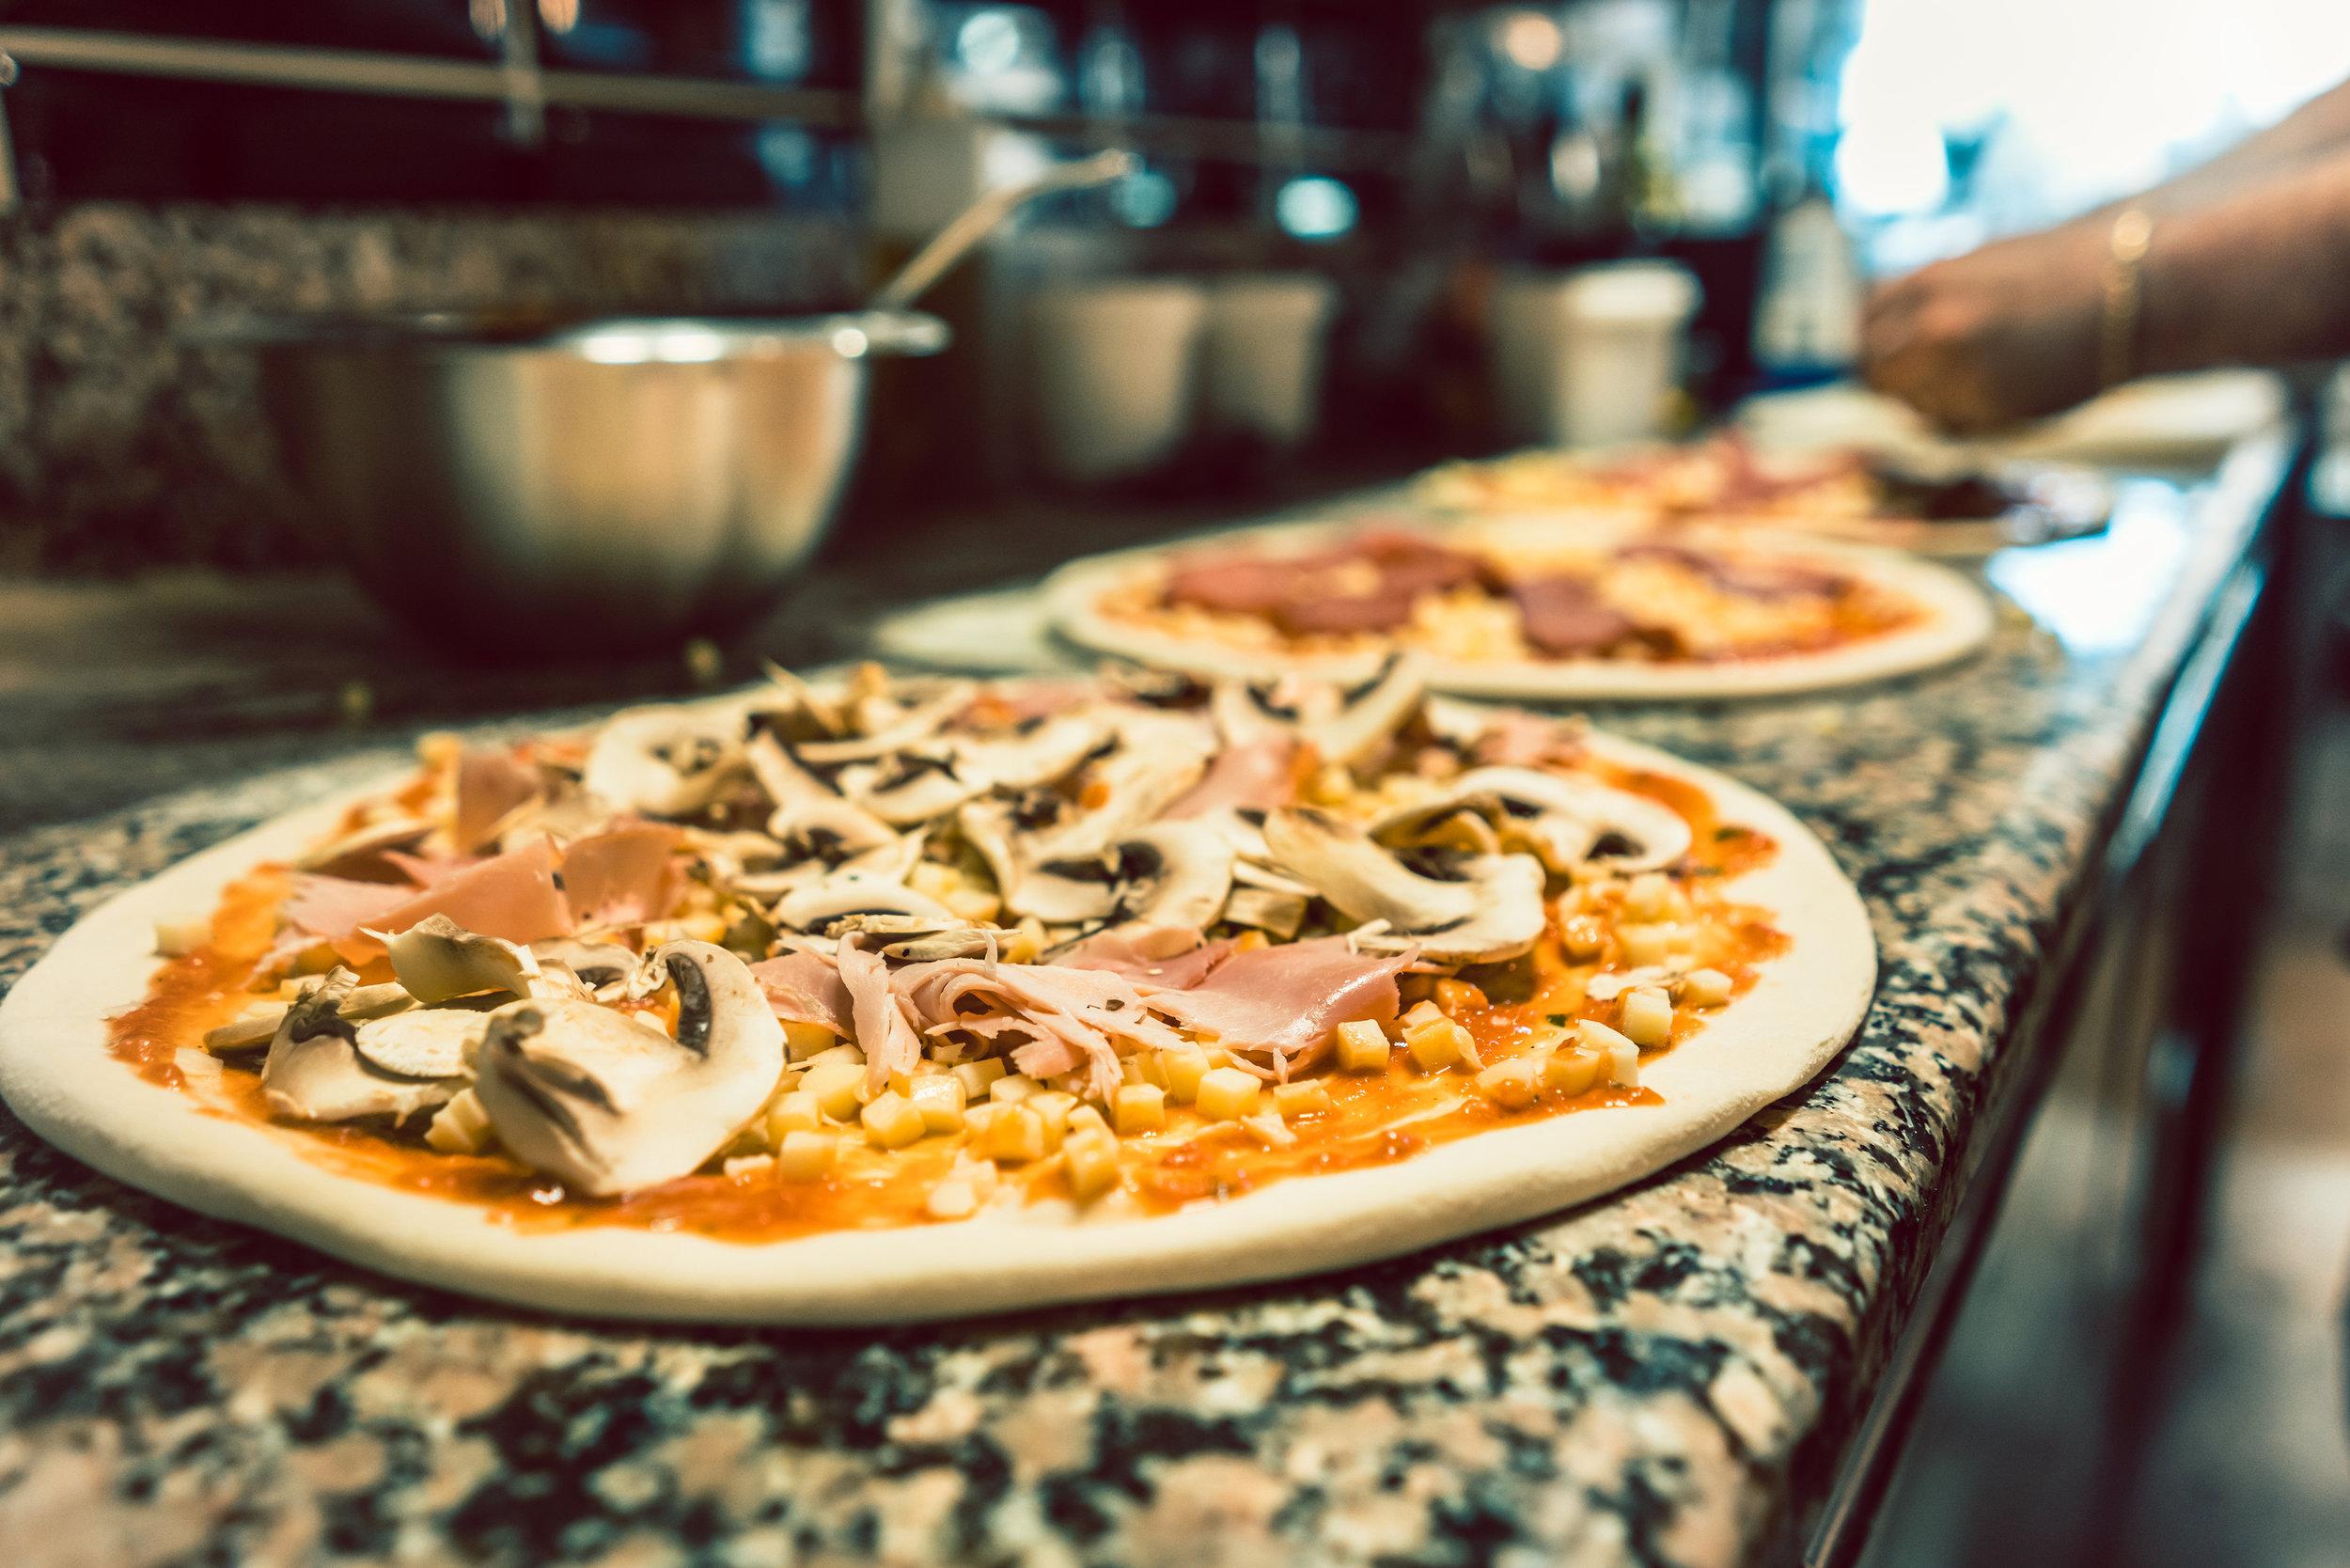 bigstock-Close-up-of-unbaked-pizza-doug-241154497 (1).jpg